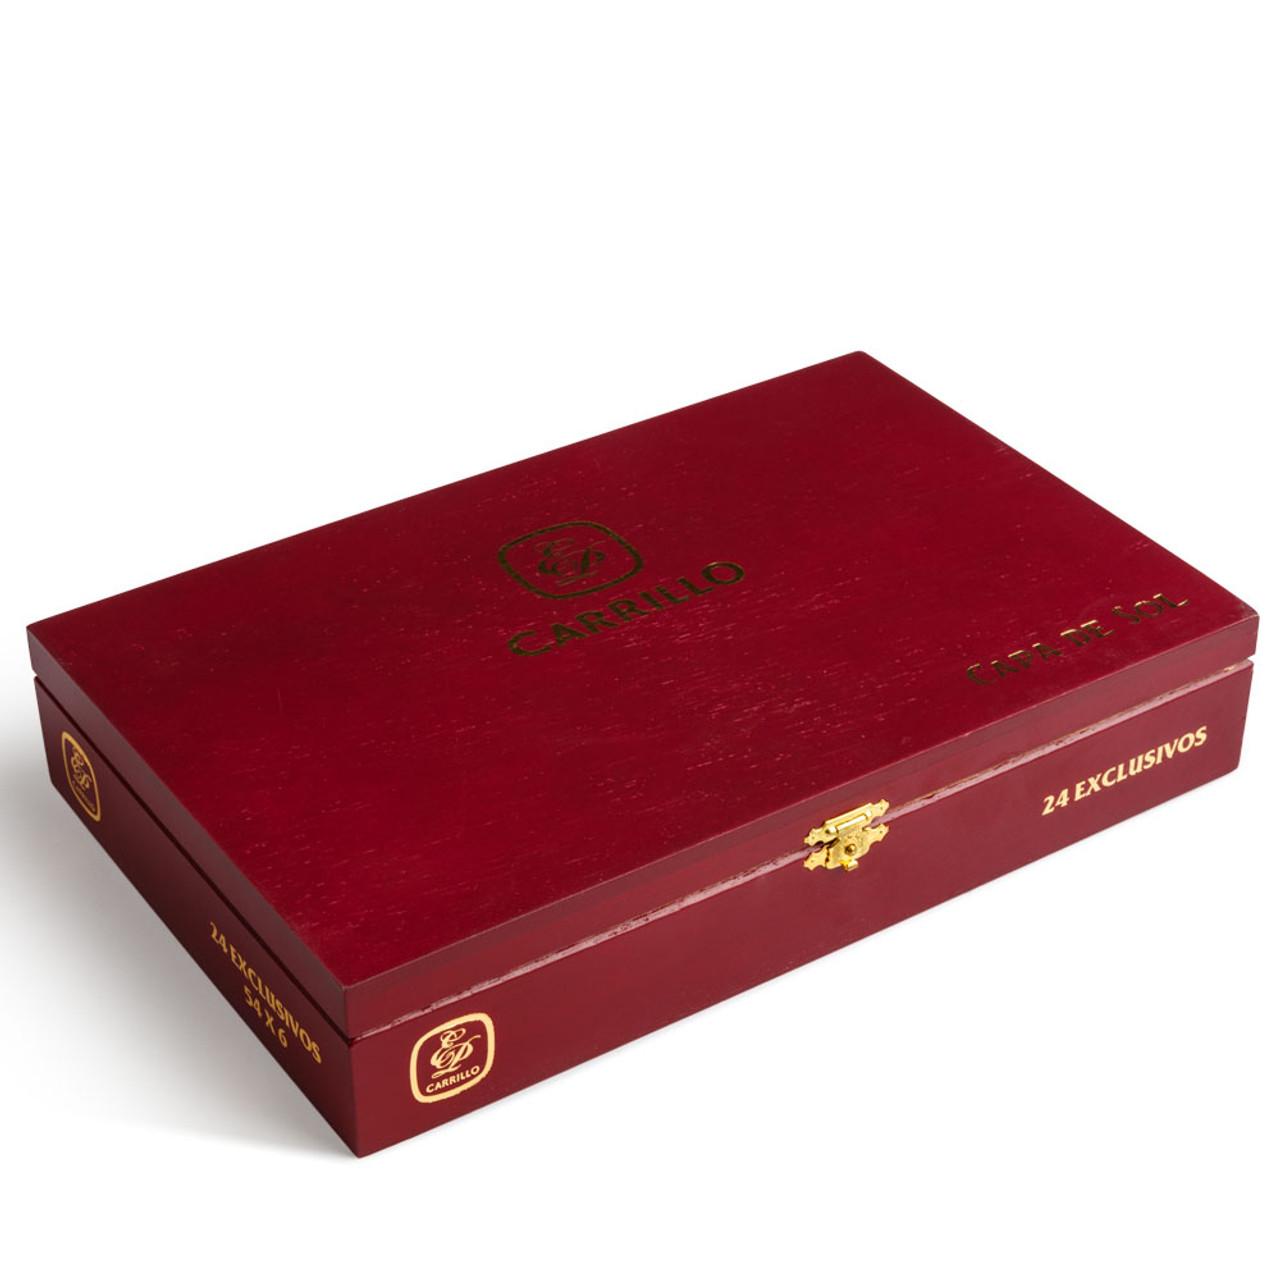 Capa de Sol by E.P. Carrillo Piramides No.5 Cigars - 5.75 x 52 (Box of 24)